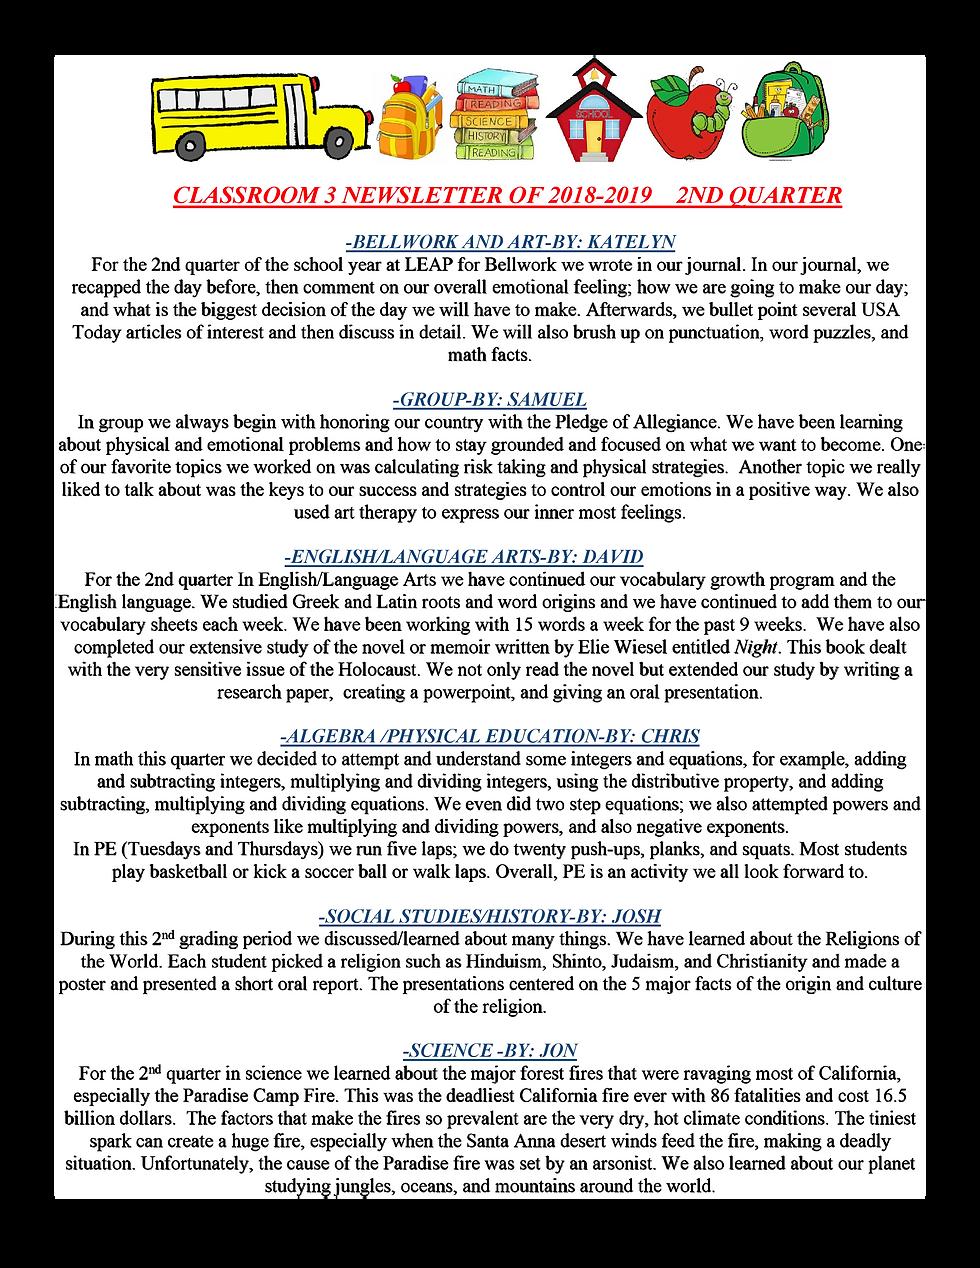 Classroom 3 Newsletter 2Q Jan 2019-0.png